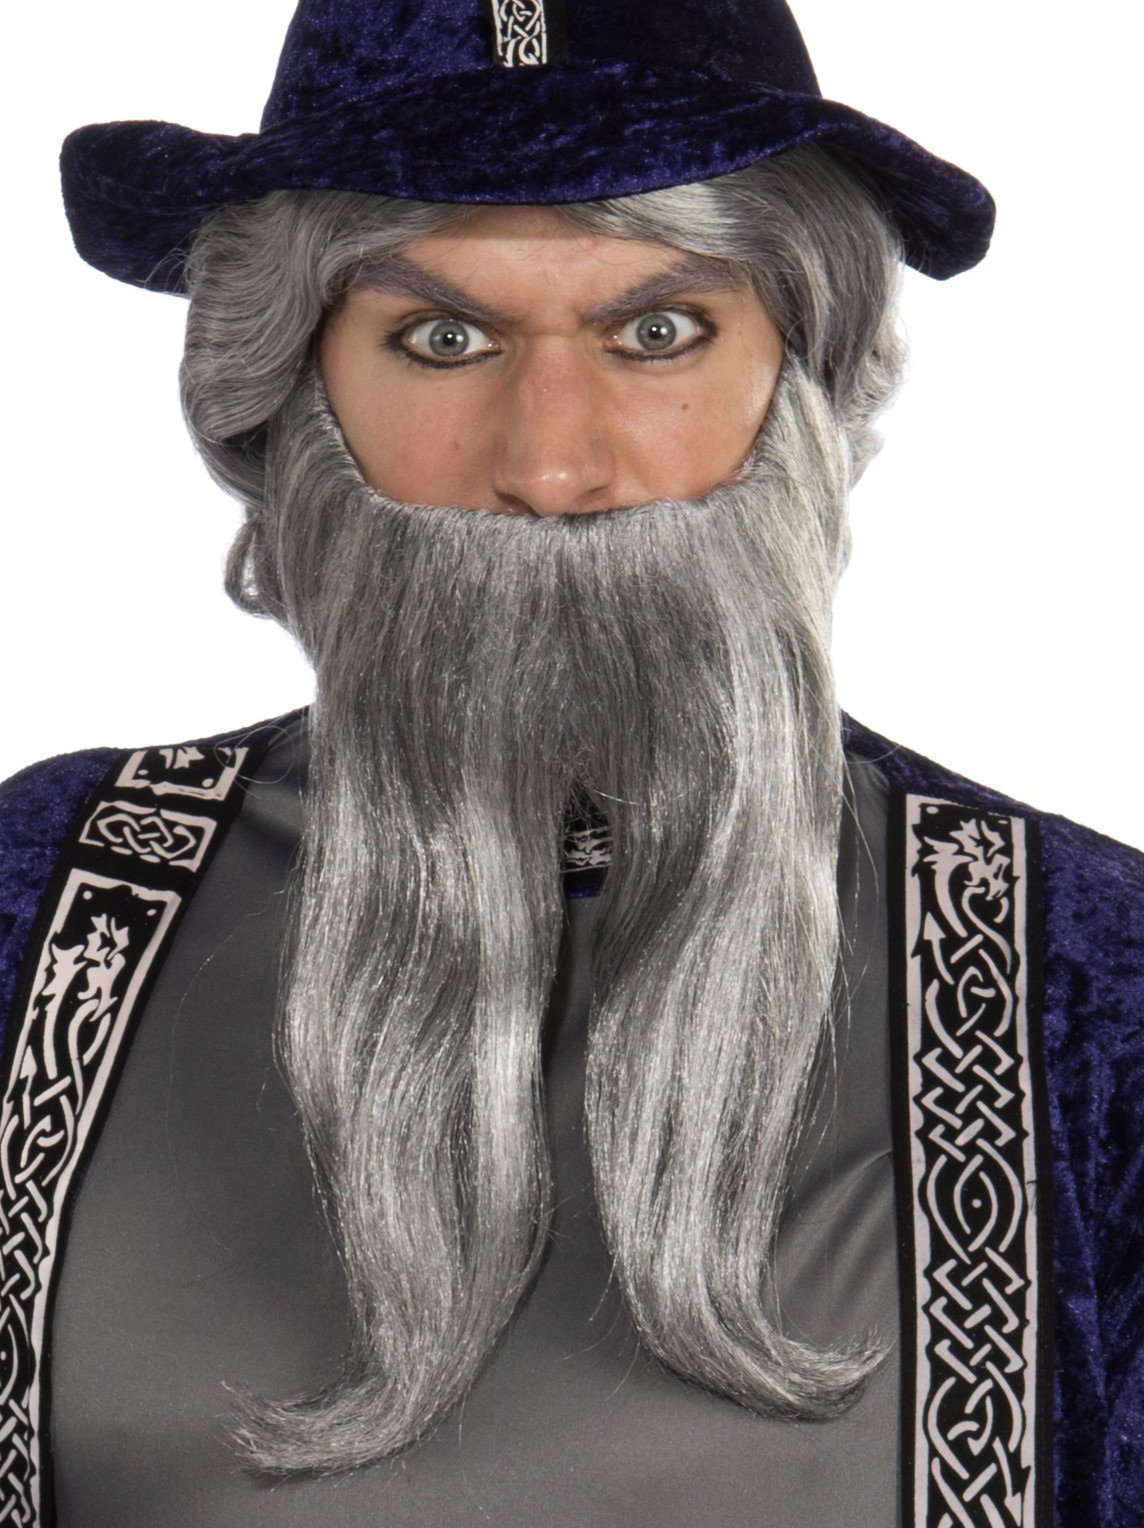 Forum Novelties Men's Novelty Forked Beard, Gray, One Size